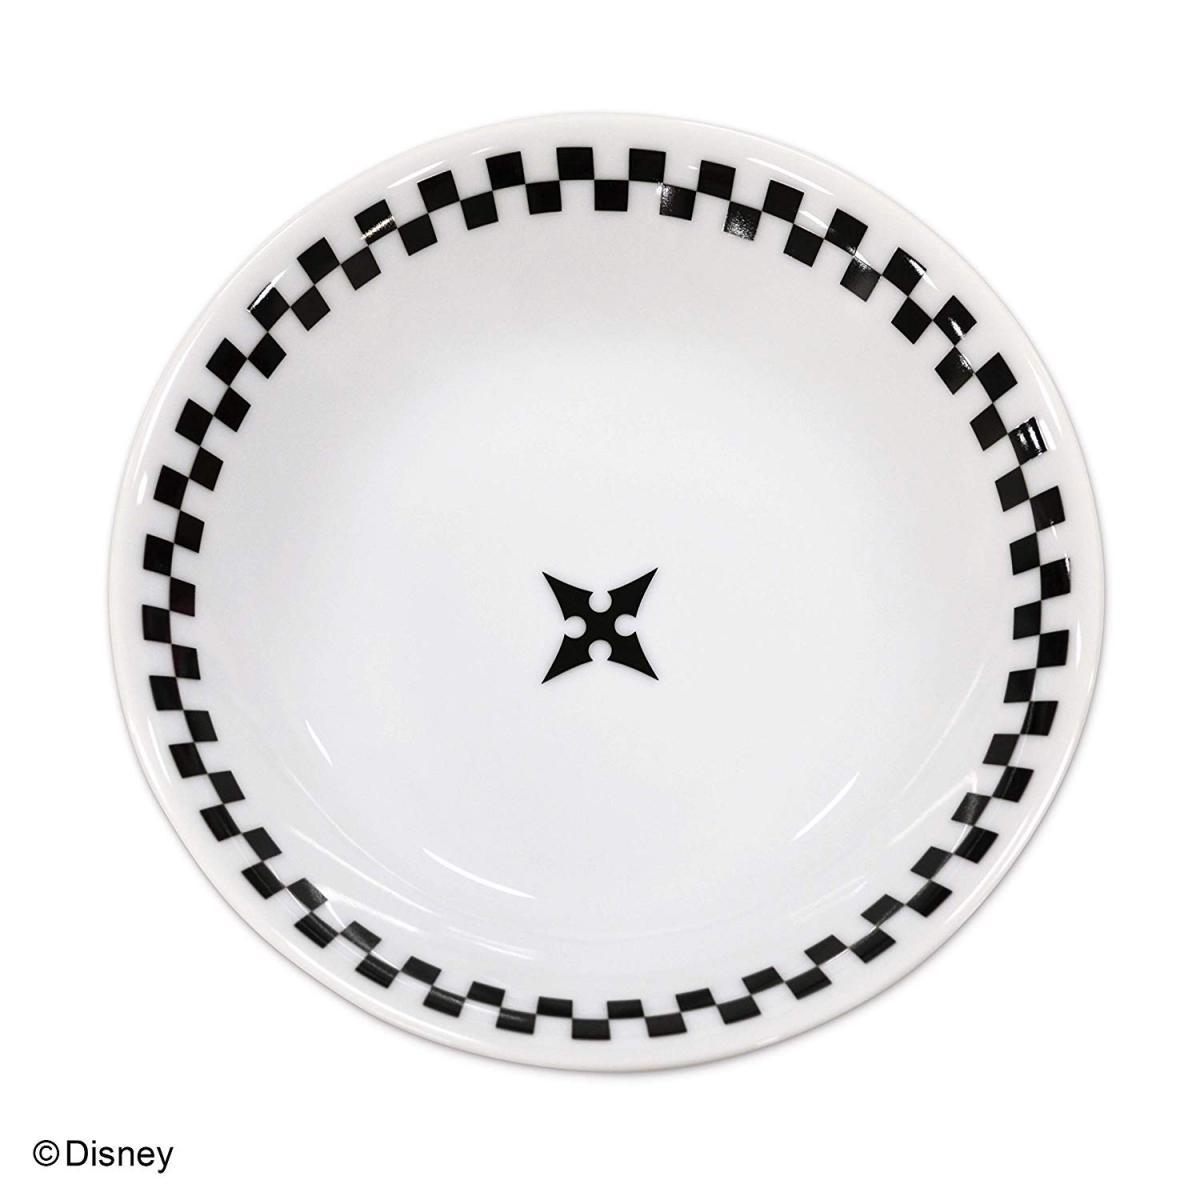 WhiteRoxas1.jpg